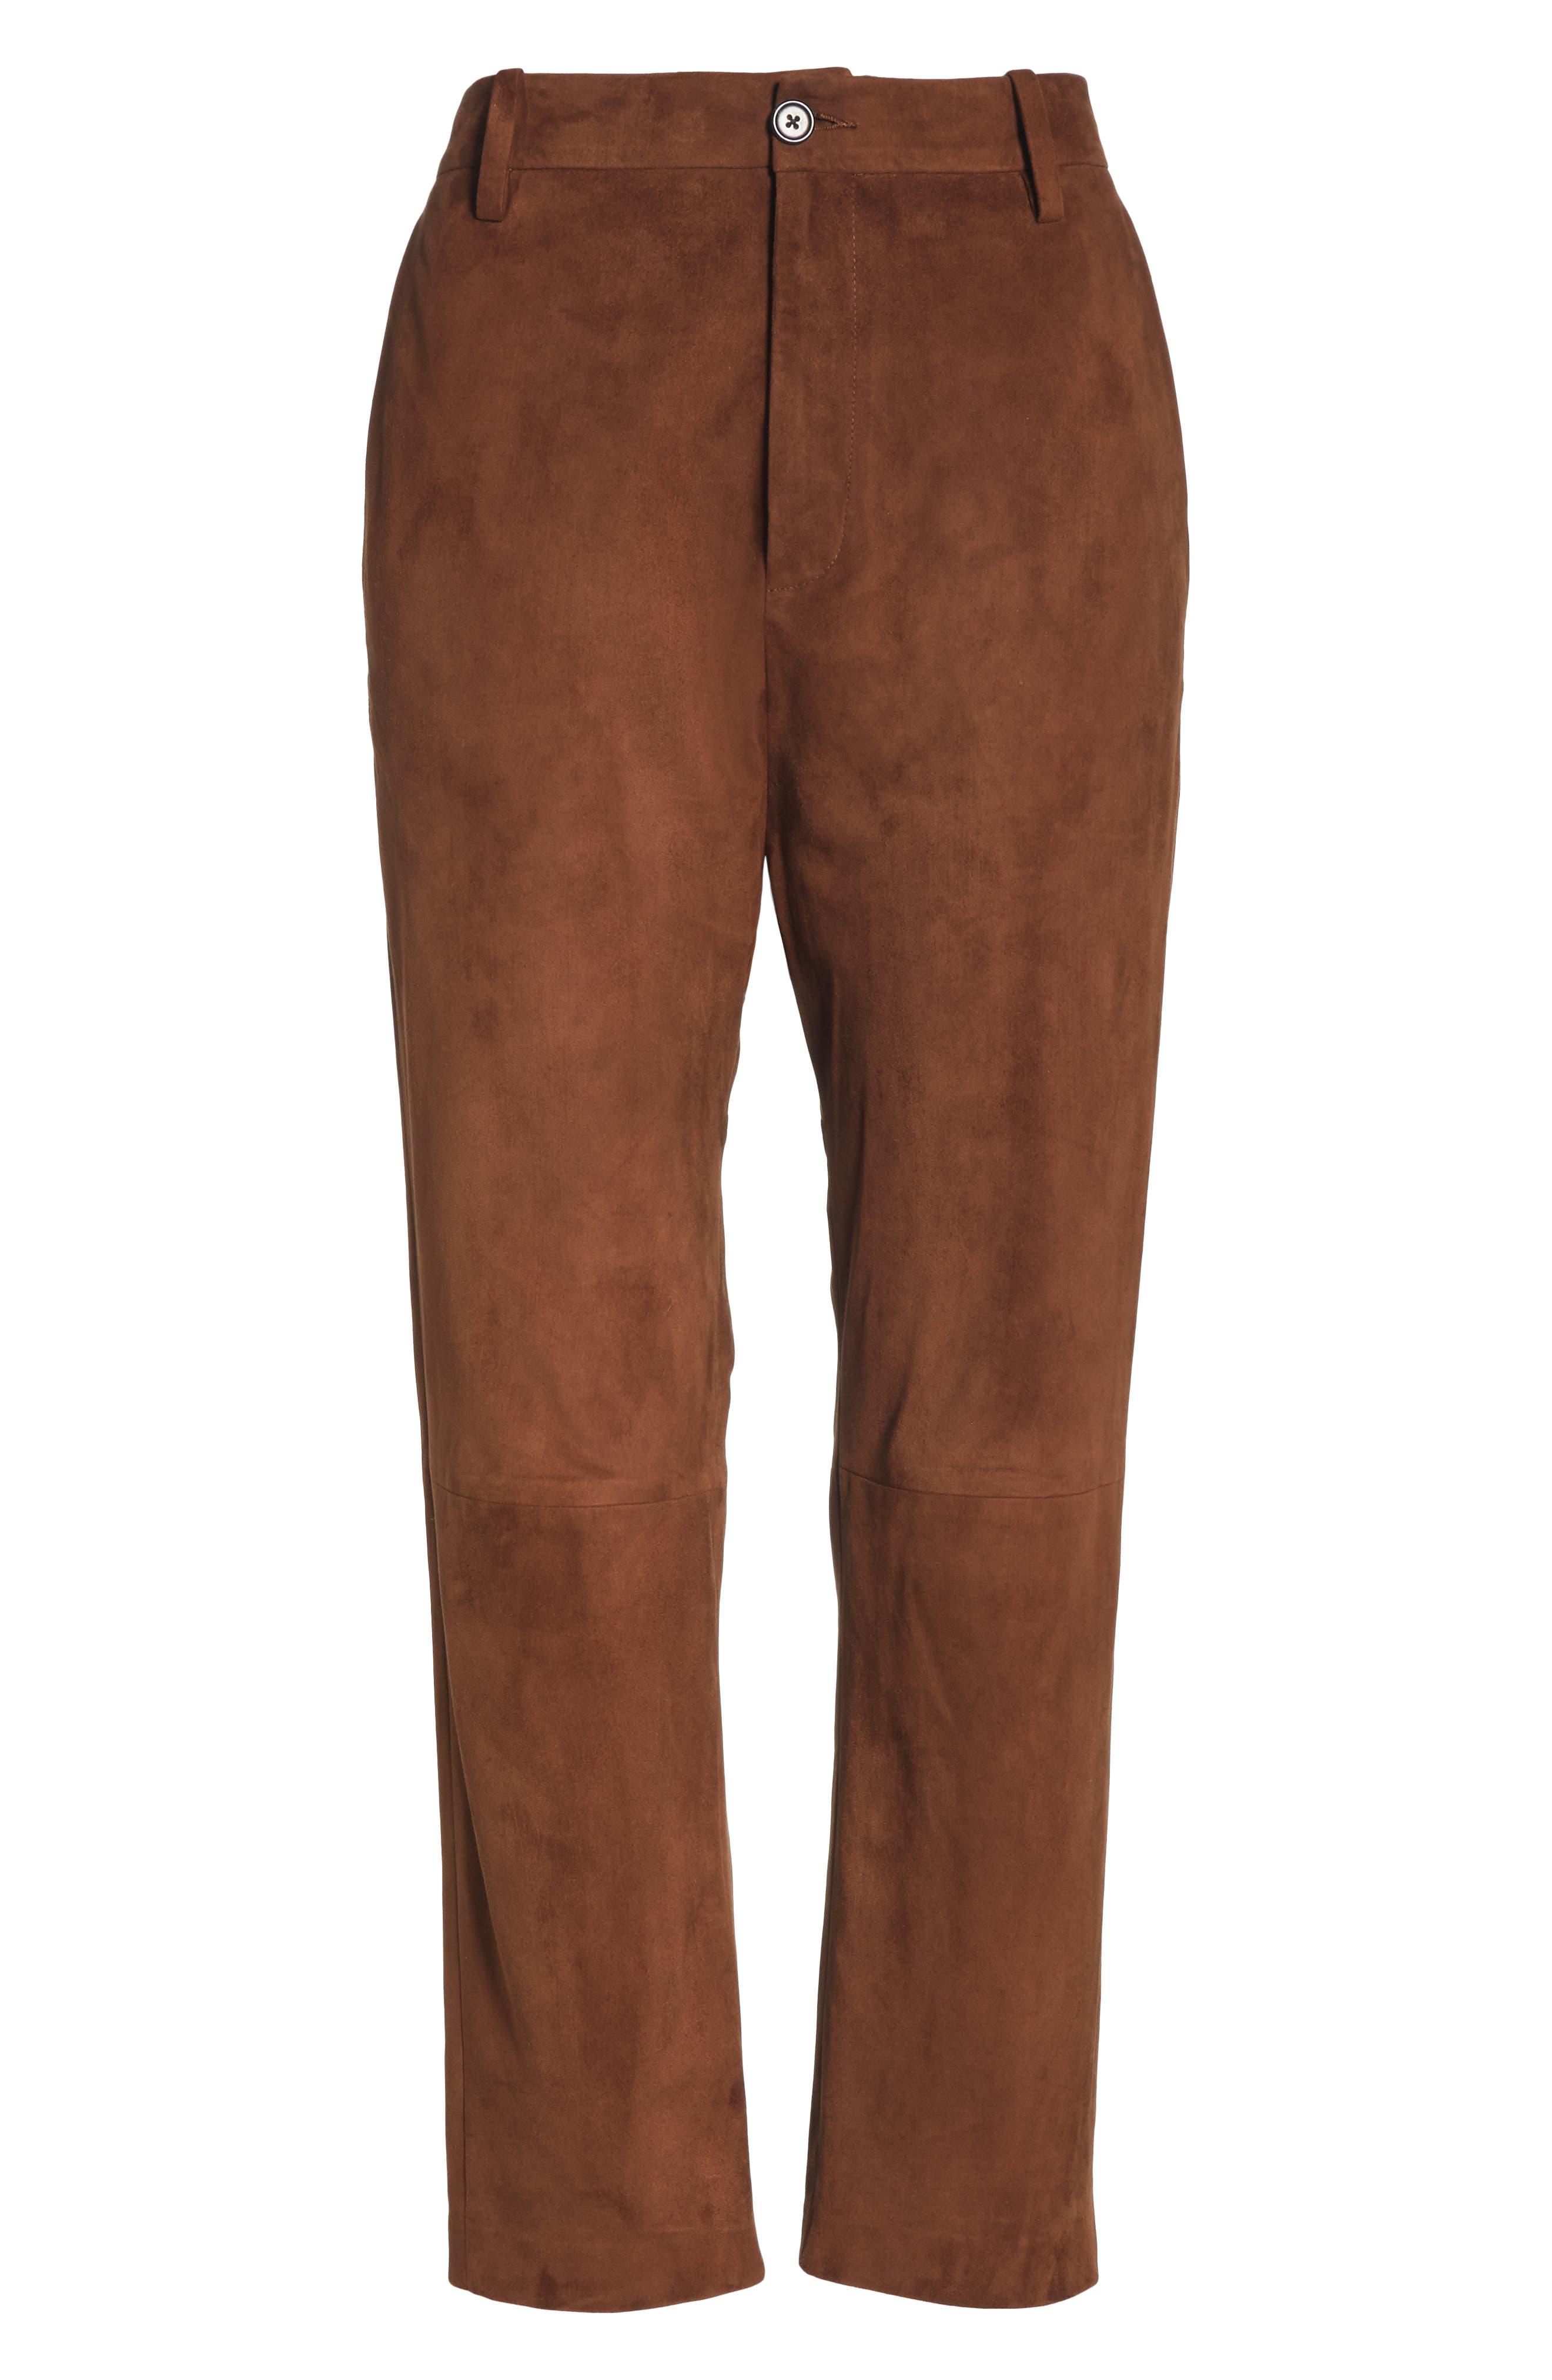 NILI LOTAN,                             Paris Leather Pants,                             Alternate thumbnail 7, color,                             DARK COGNAC